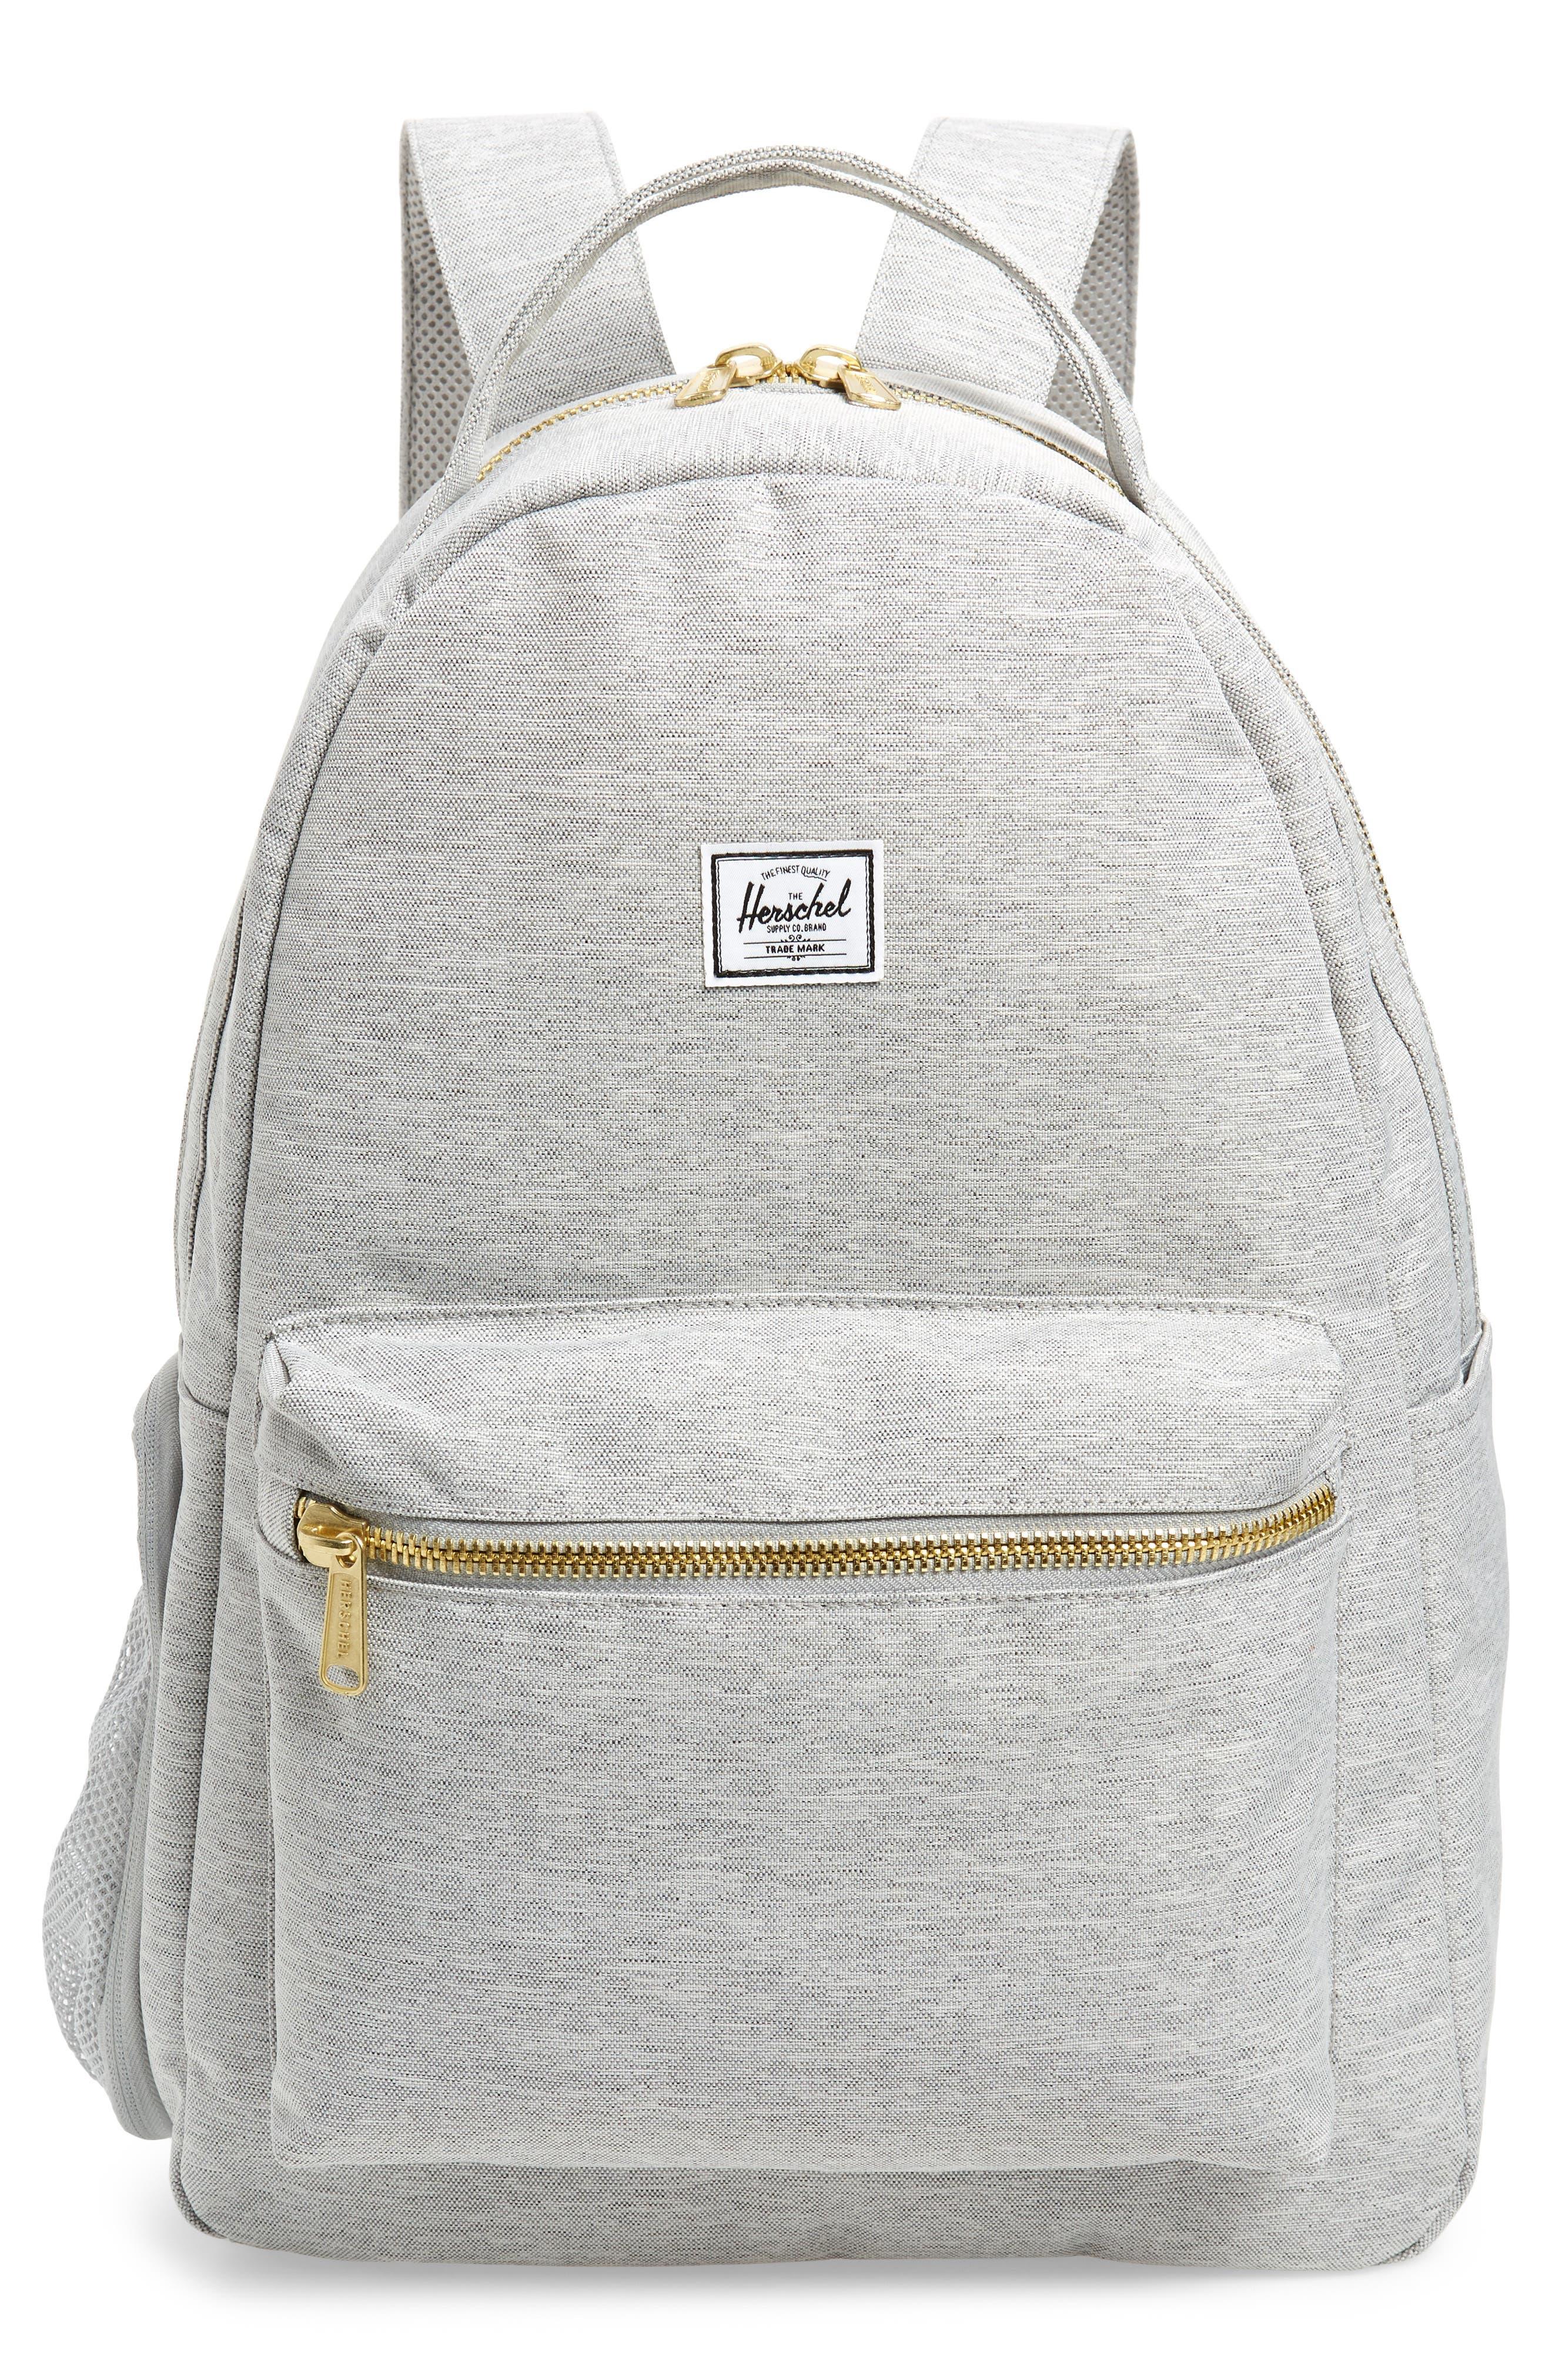 Infant Herschel Supply Co Nova Sprout Diaper Backpack  Grey